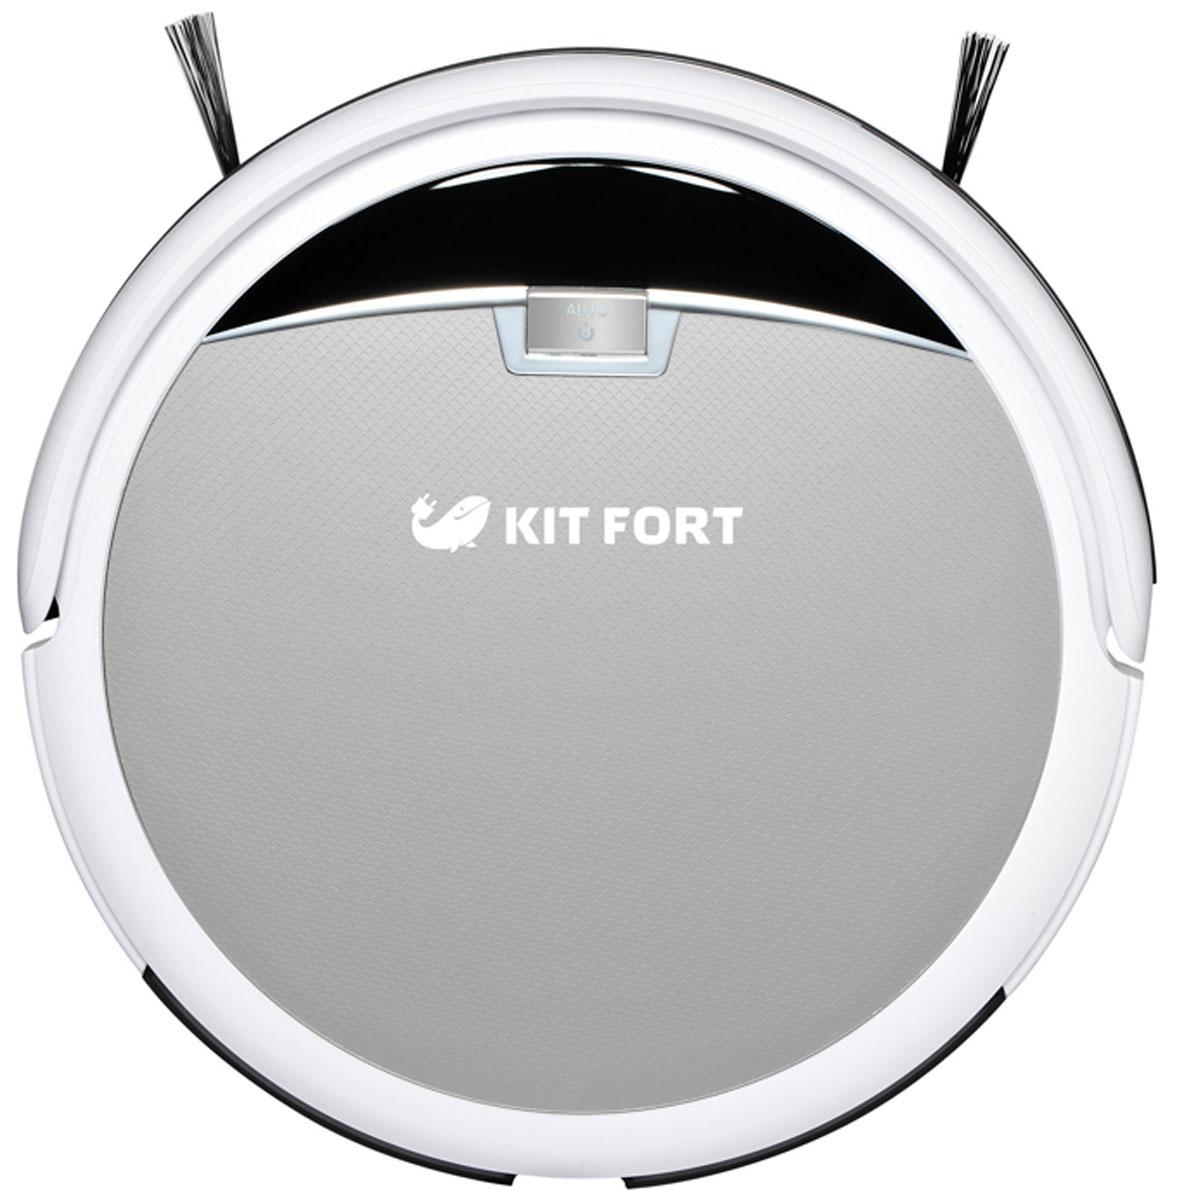 Kitfort KT-519-2, Silver робот-пылесос ( KT-519-2 серебро )